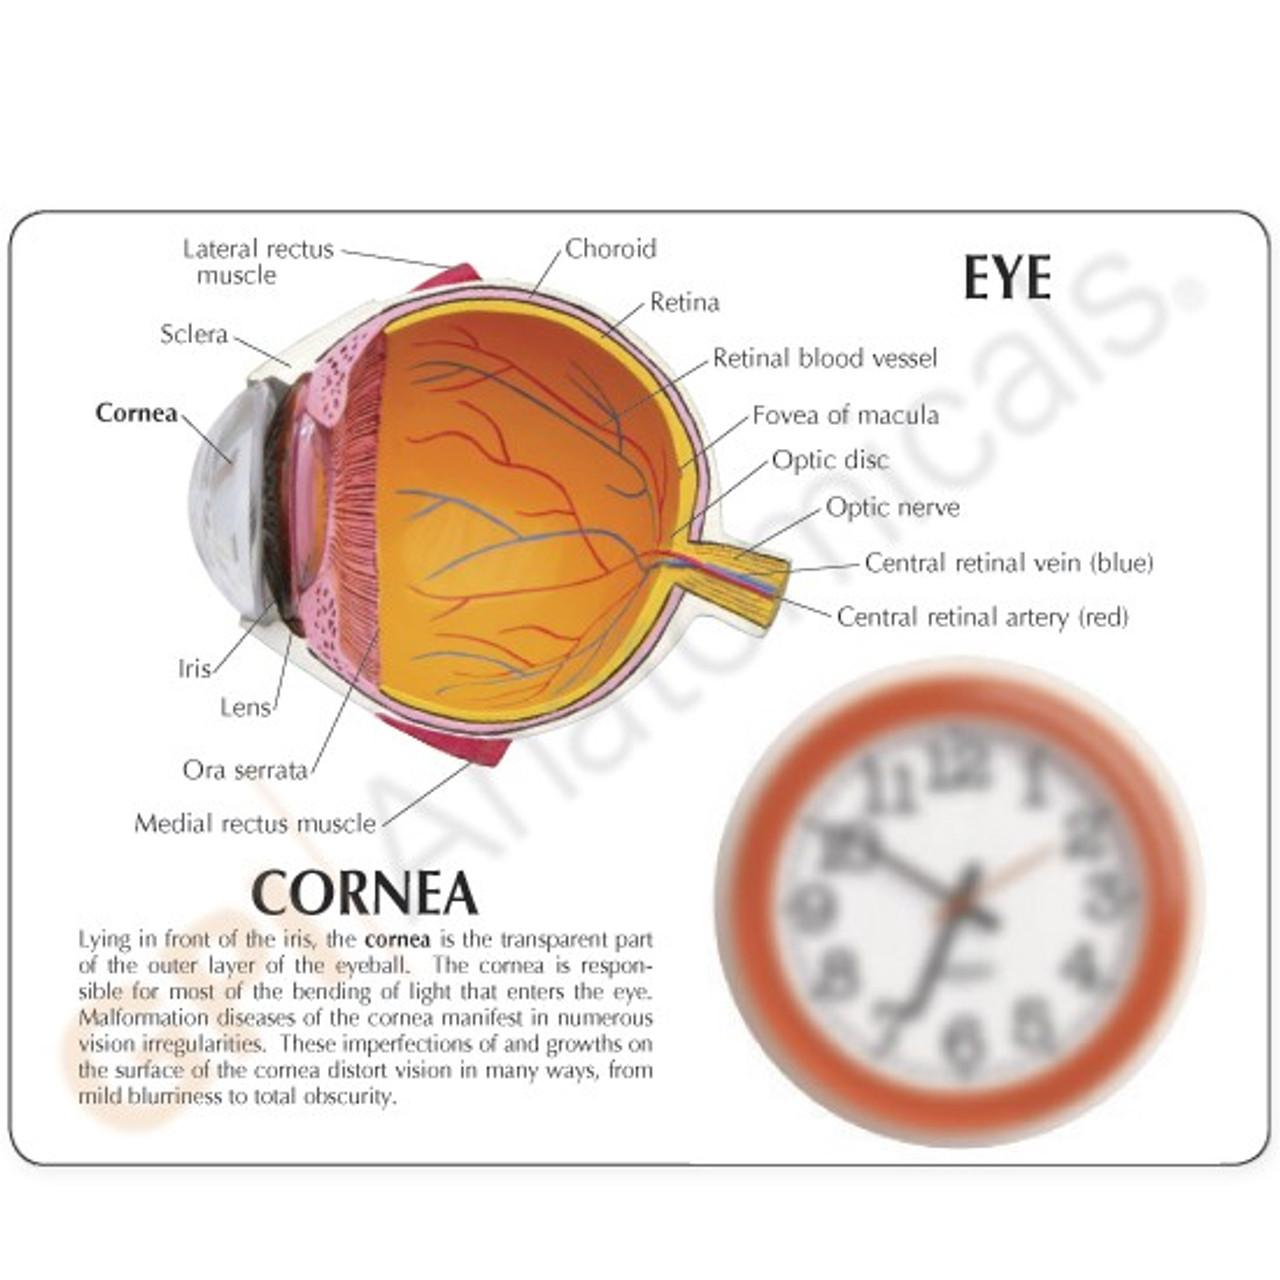 Cornea Eye Model Description Card